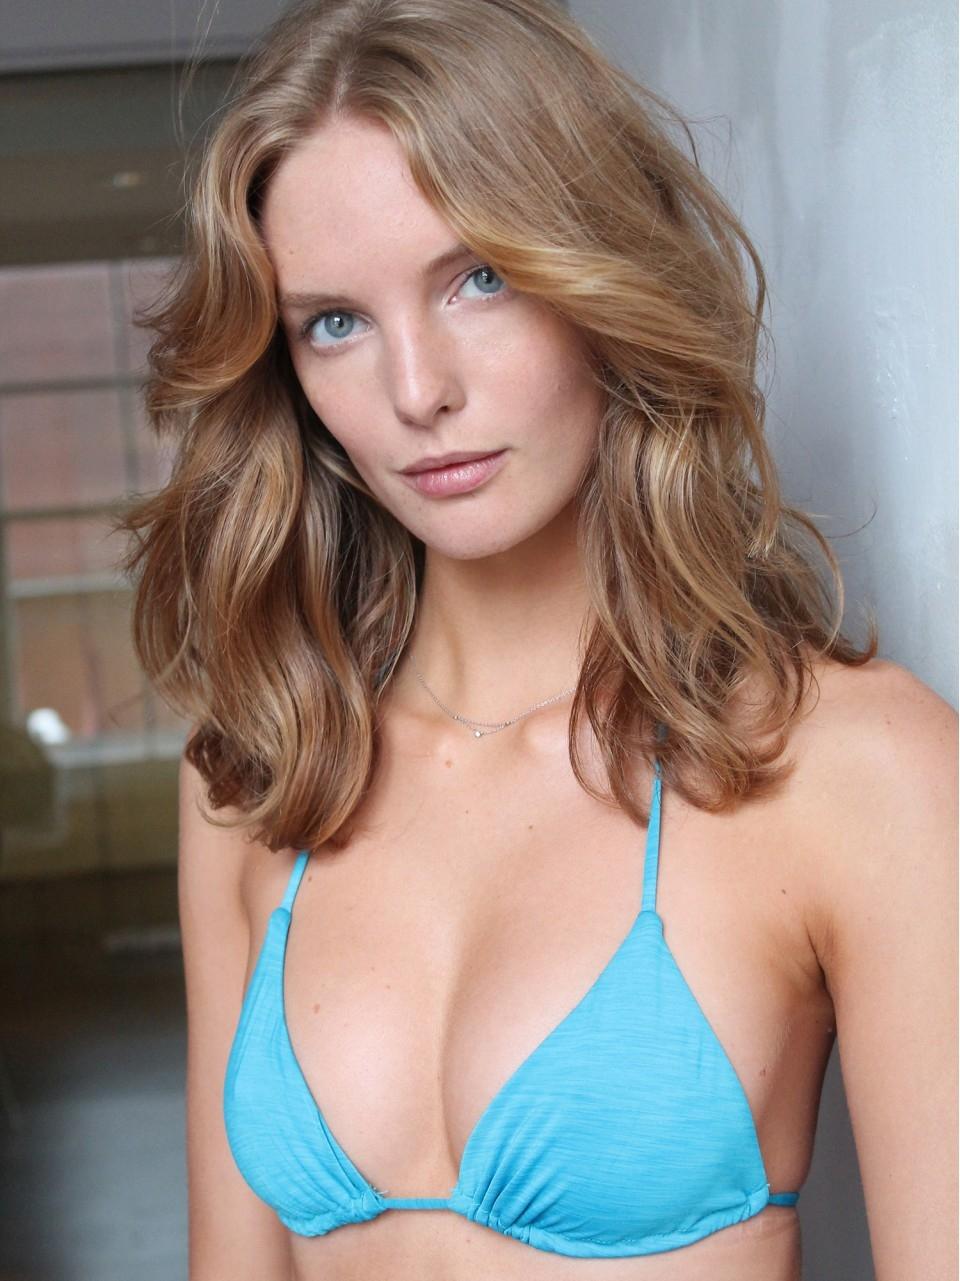 Bikini Clara Settje nude photos 2019